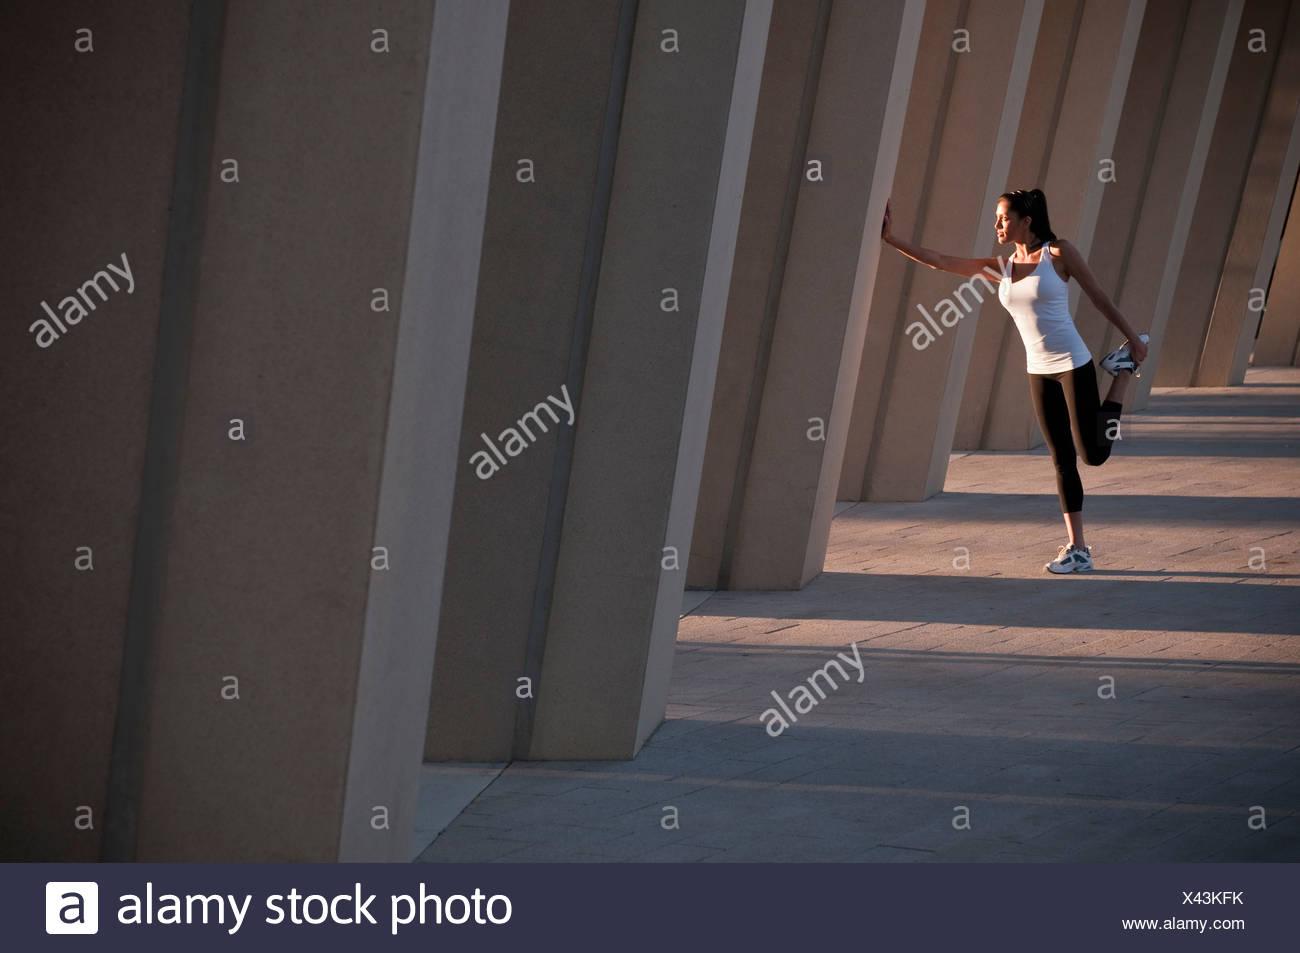 Runner stretching on concrete pillar - Stock Image